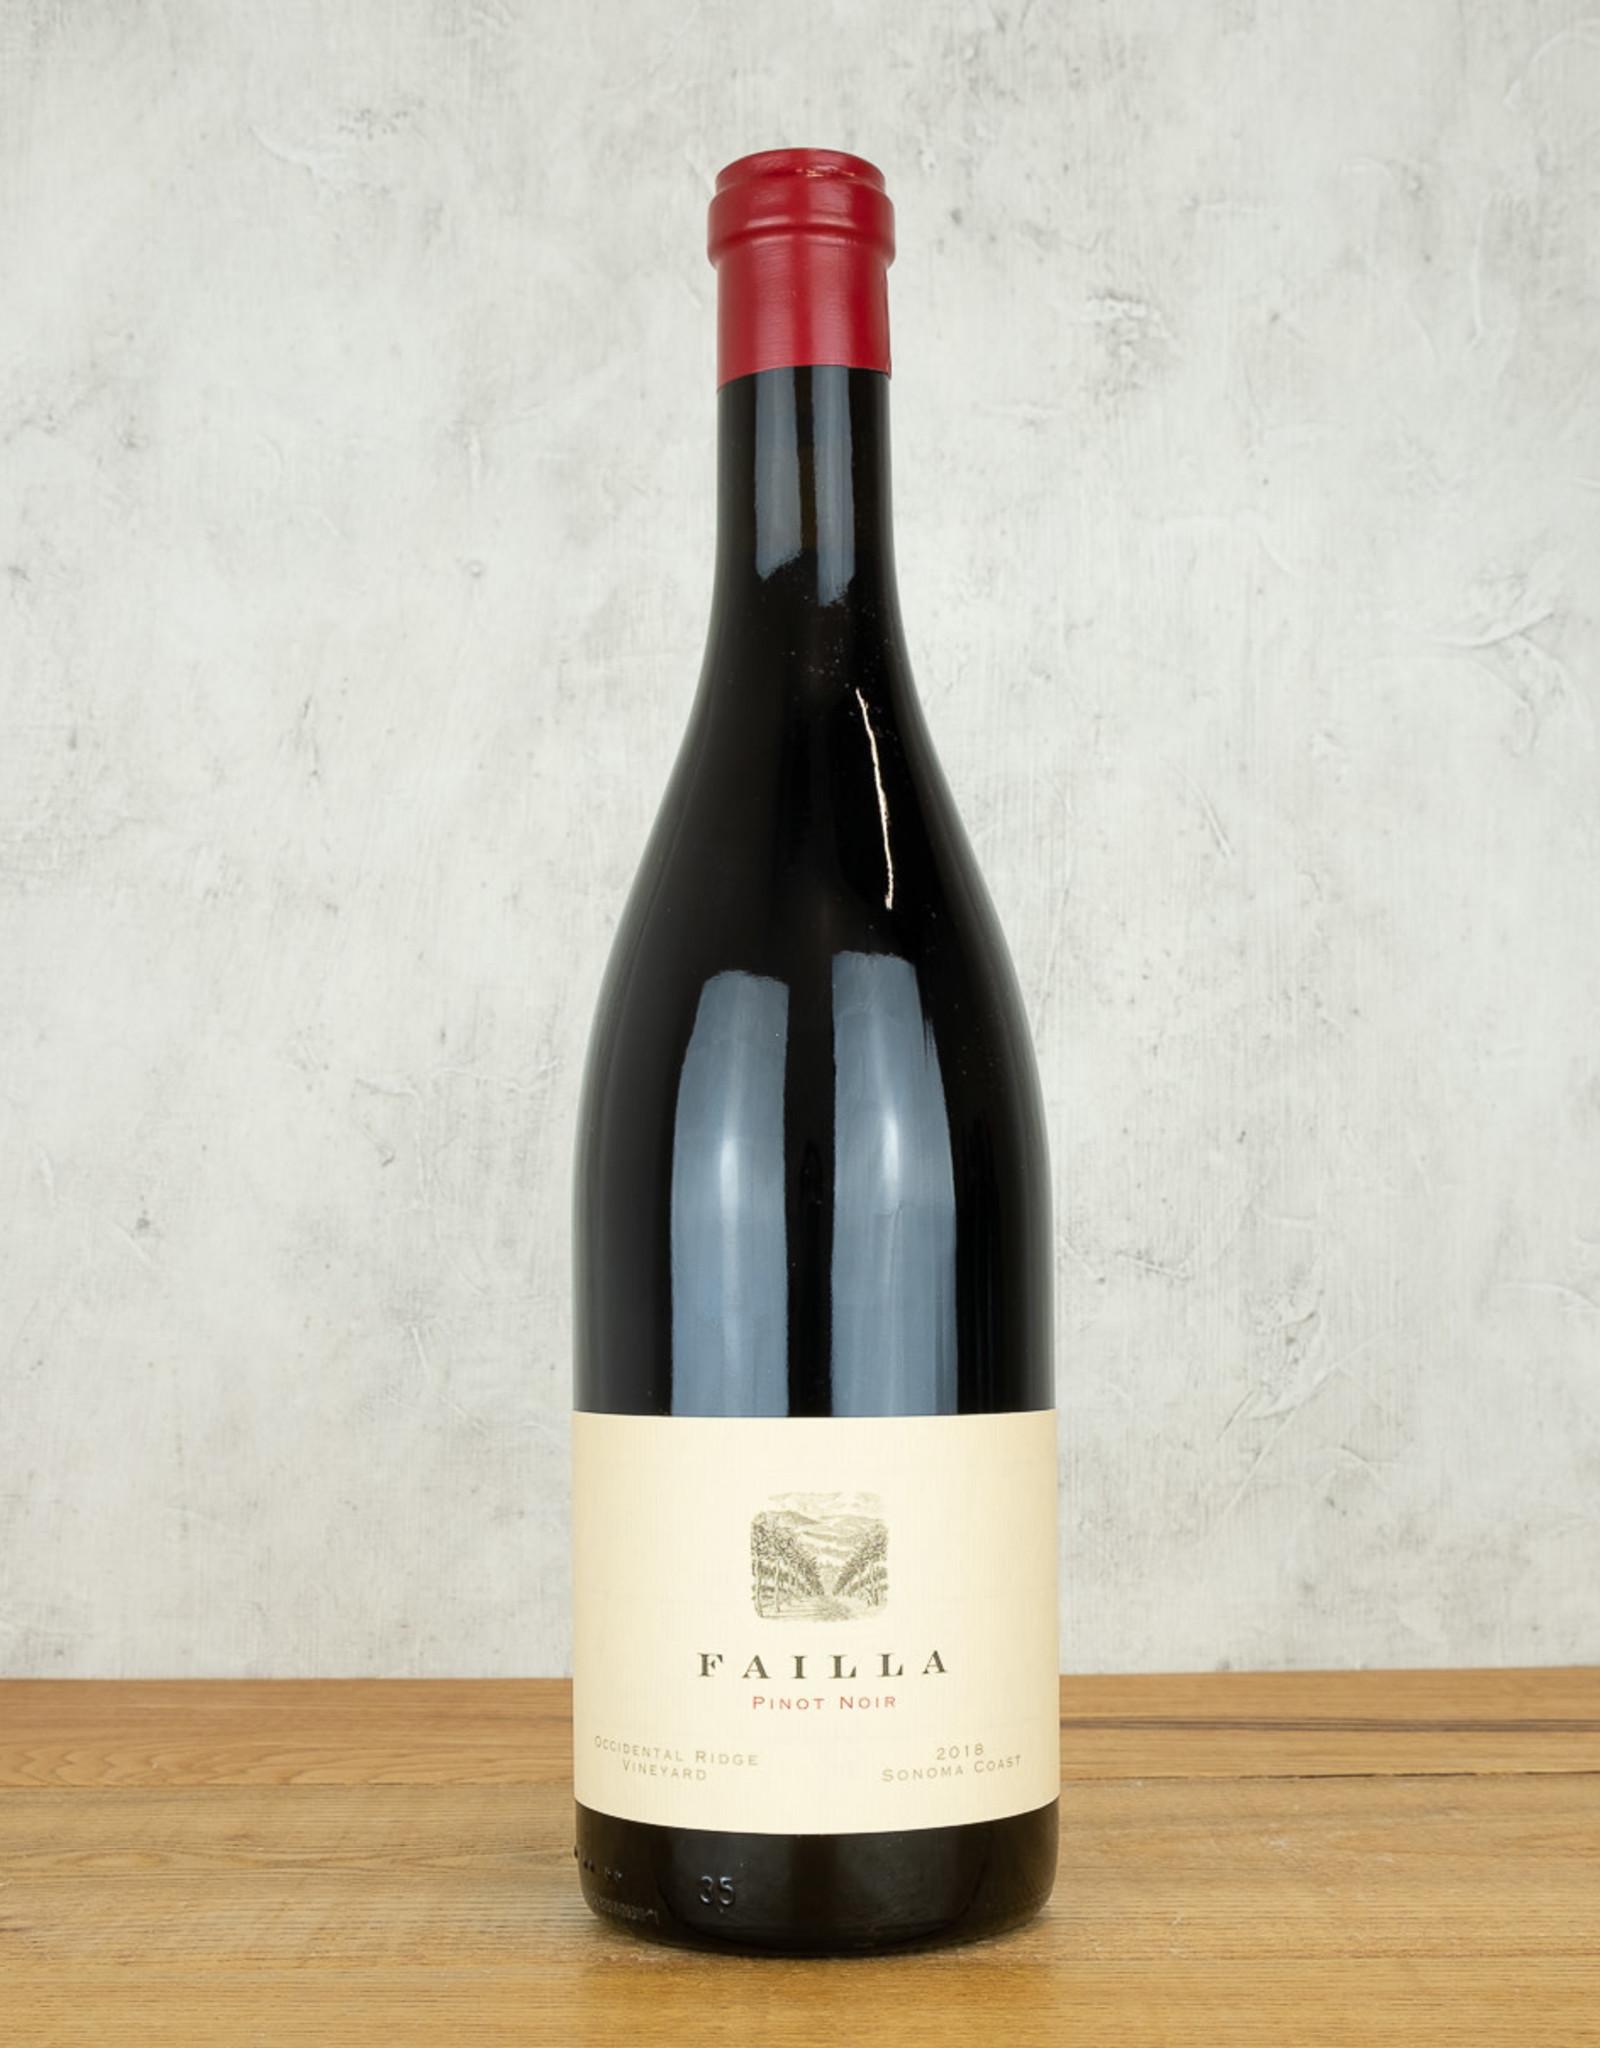 Failla Occidental Ridge Vineyard Pinot Noir